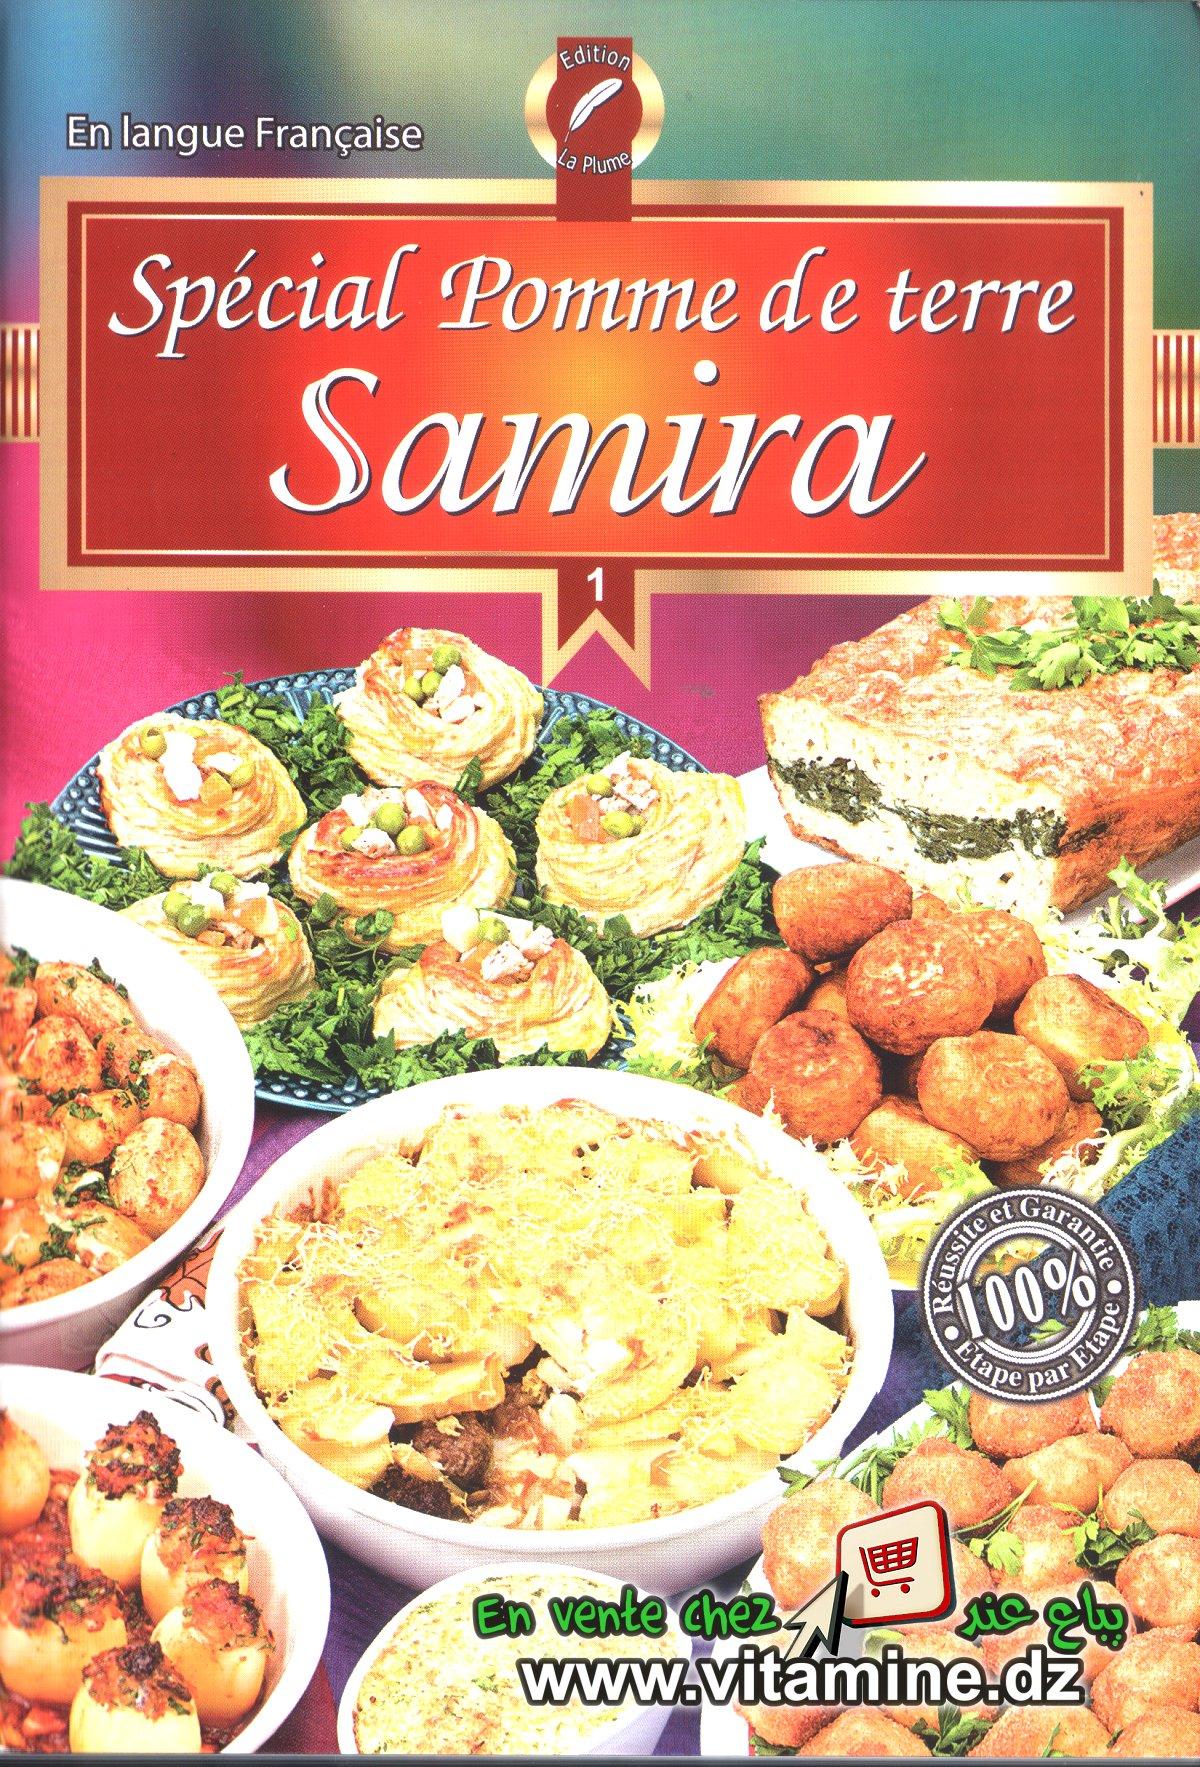 Samira - Spécial pomme de terre